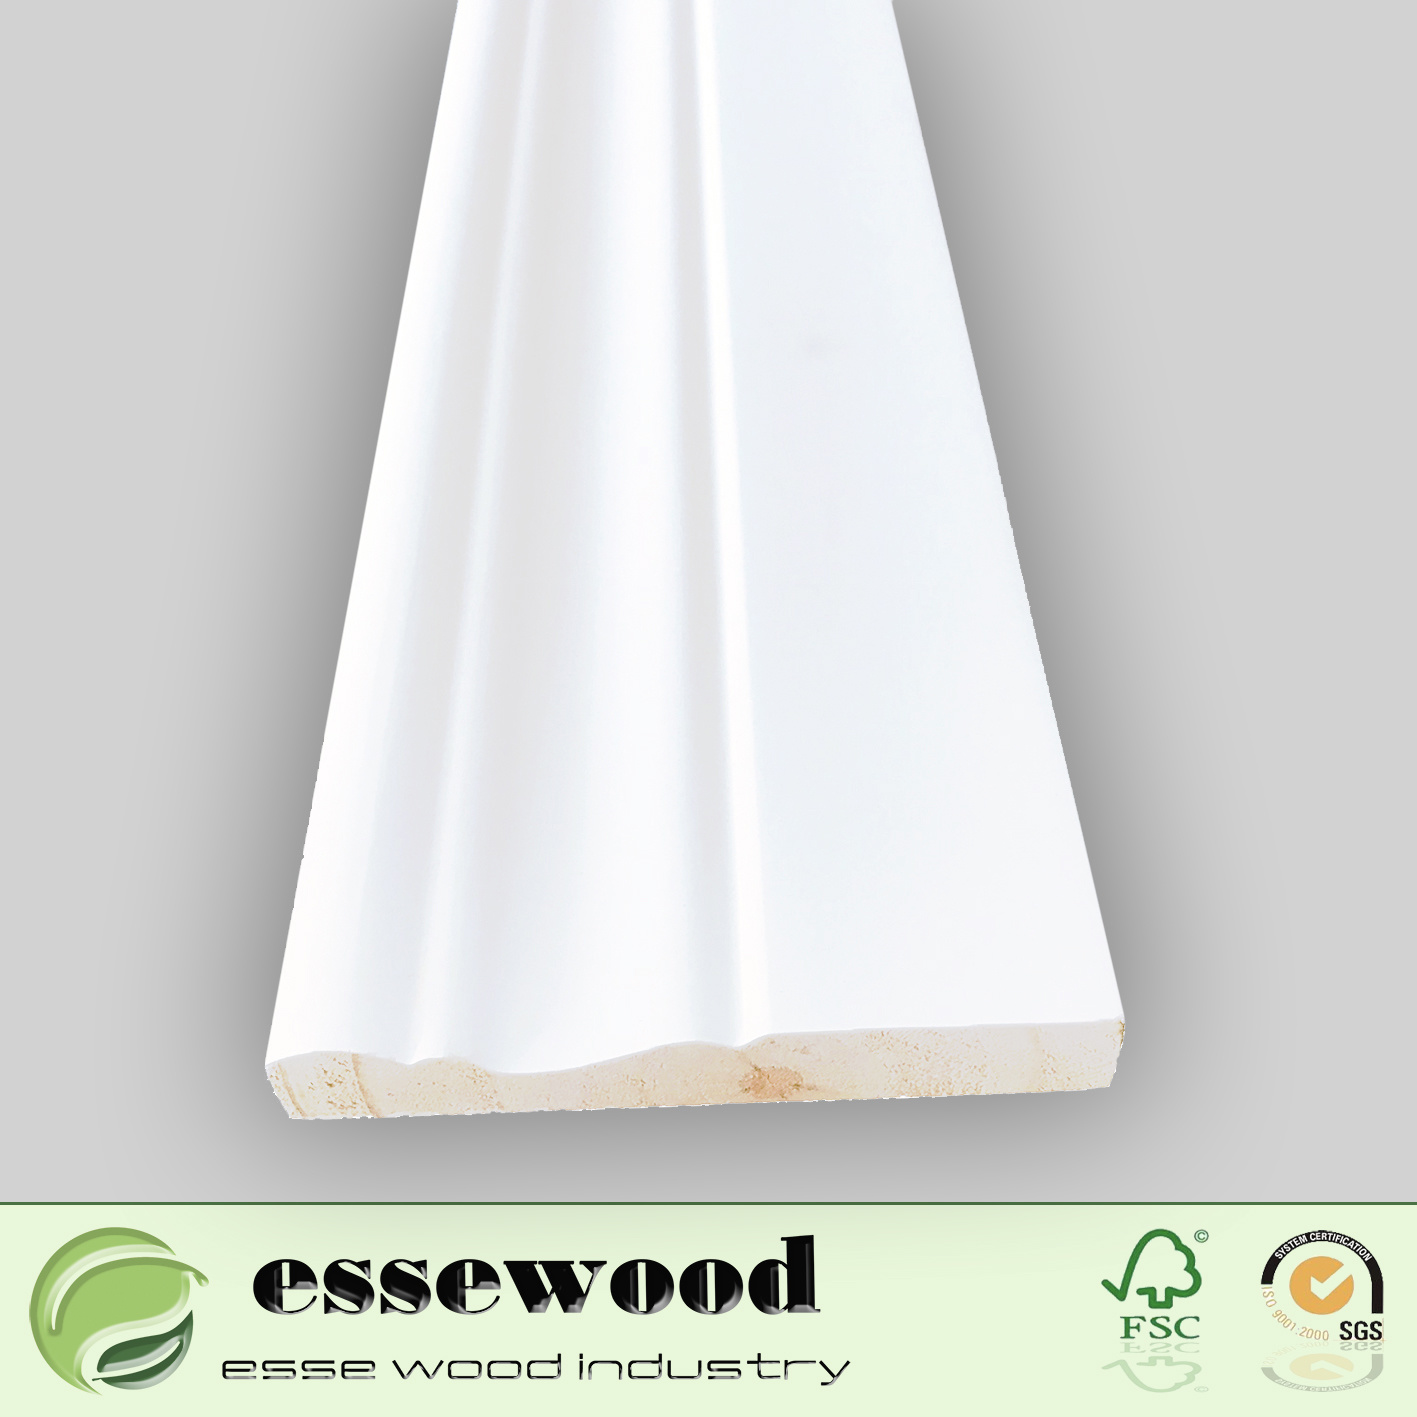 Primed Wood Trim Wall Skirting Board Floor Moulding For Laminate Flooring